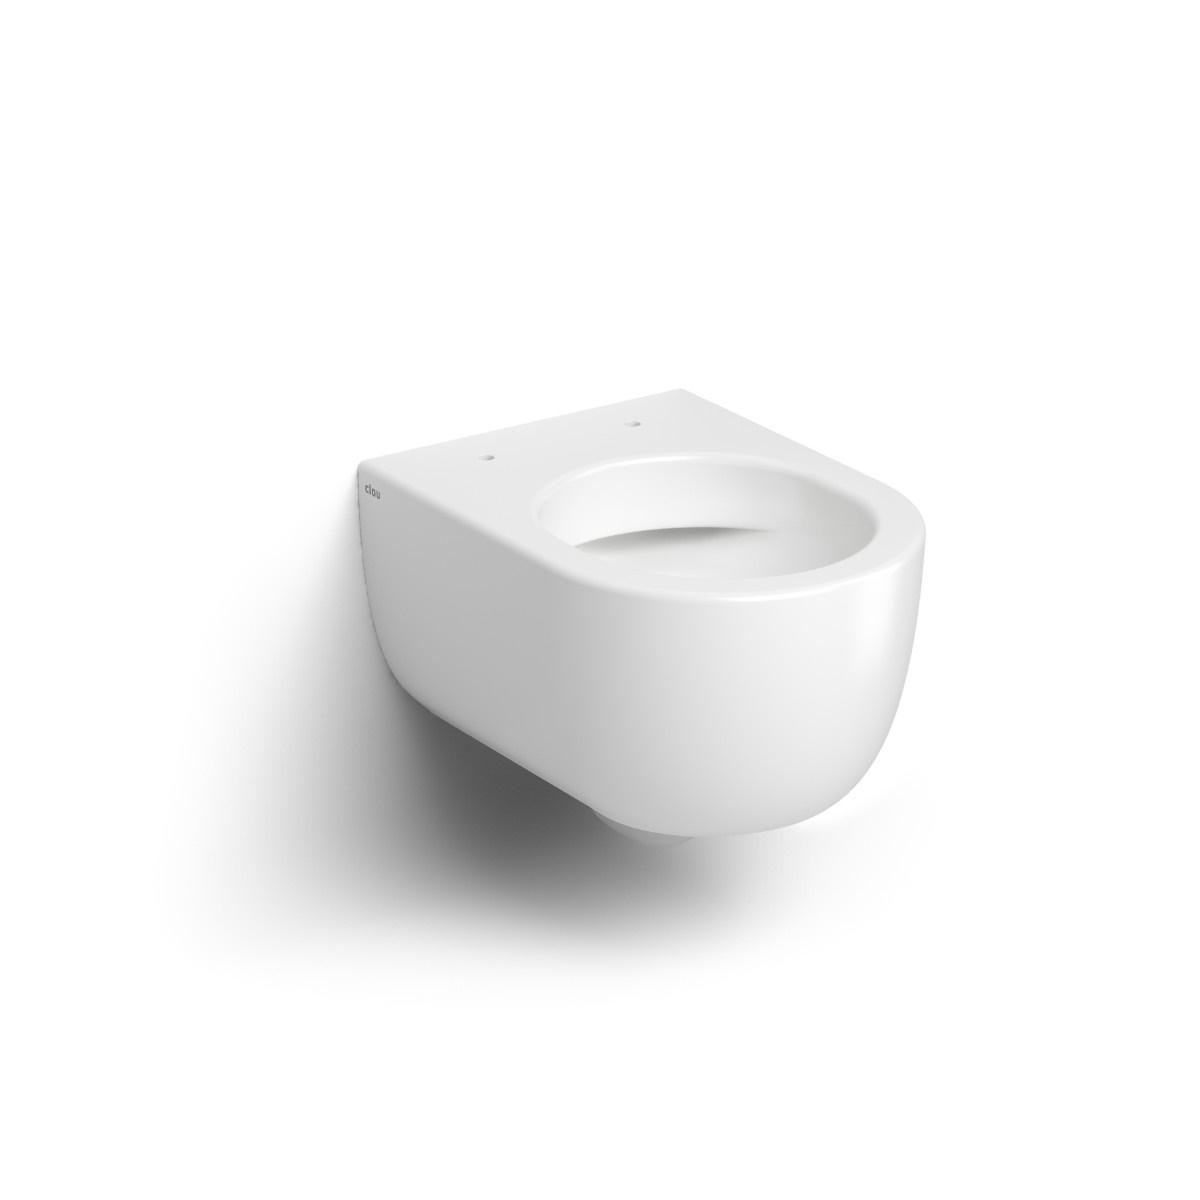 Toilet/Hangtoilet